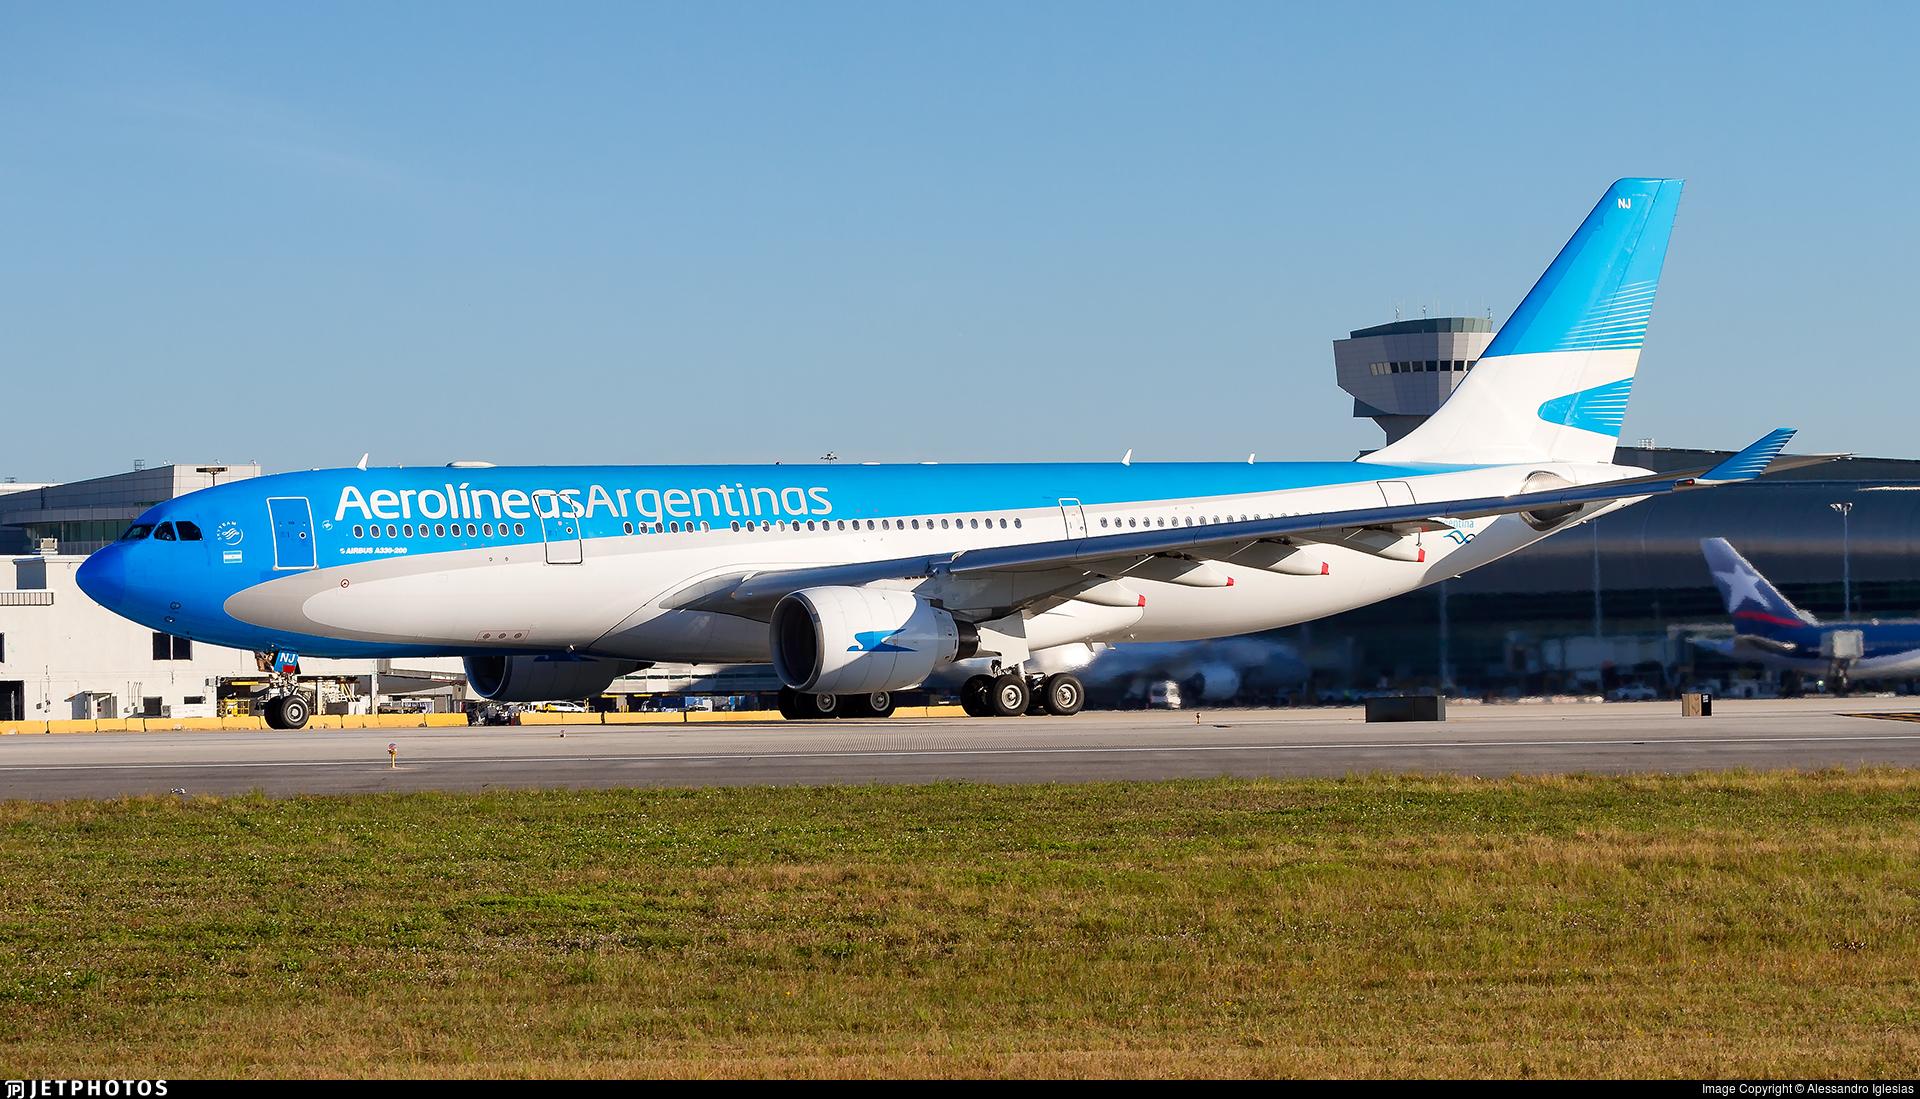 Lv Fnj Airbus A330 223 Aerolineas Argentinas Alessandro